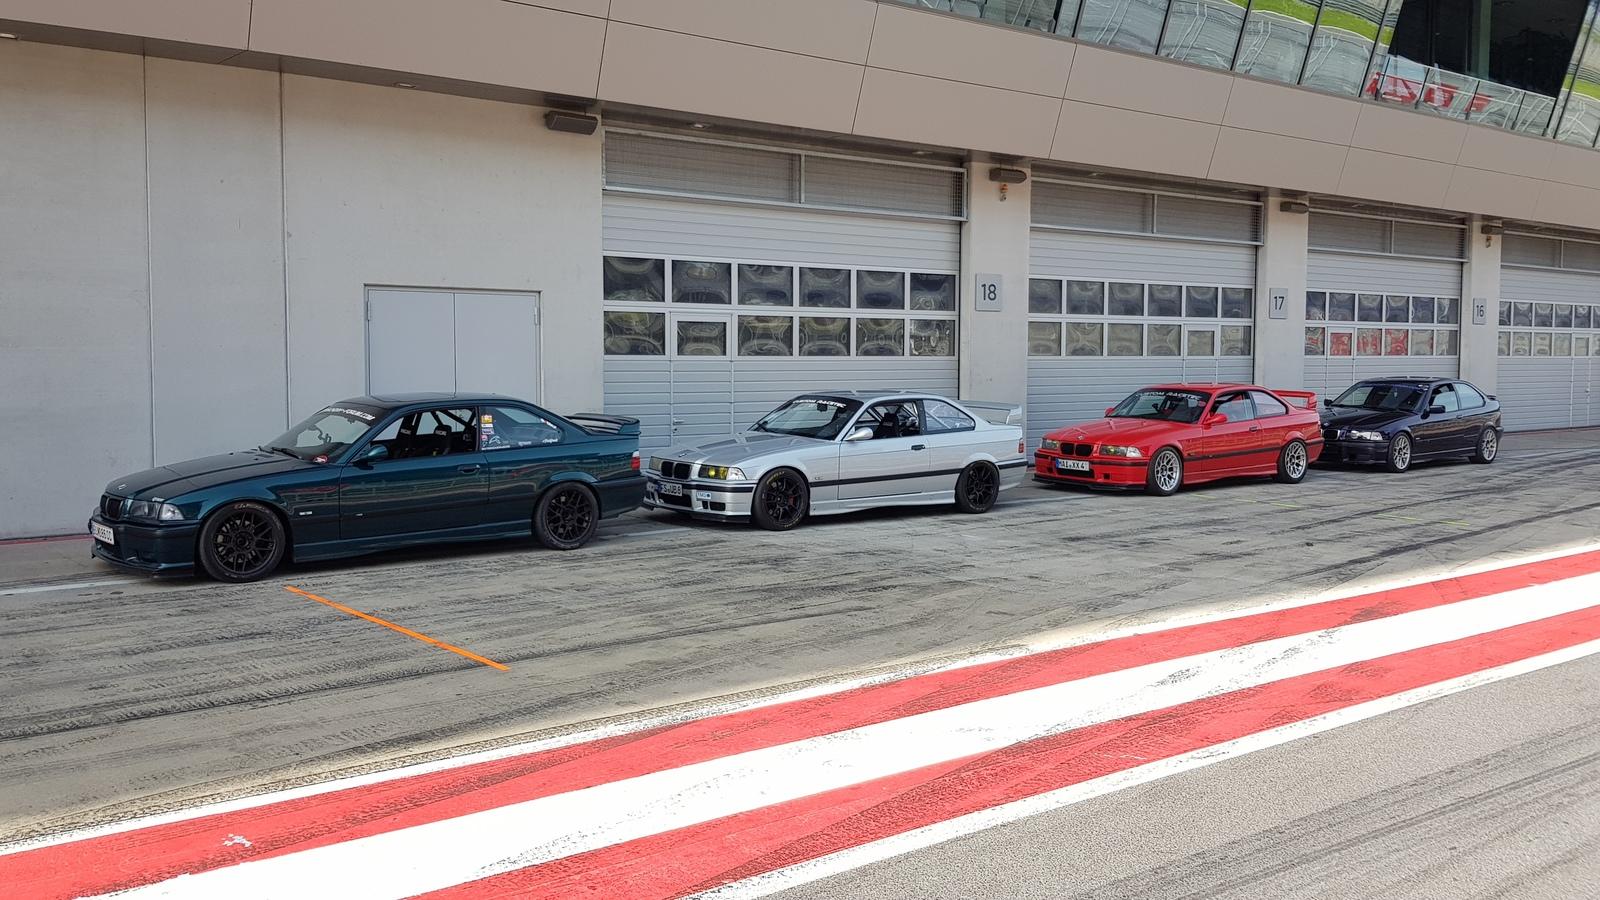 E36 Crew @ZK-Trackdays Redbullring 10.6.19